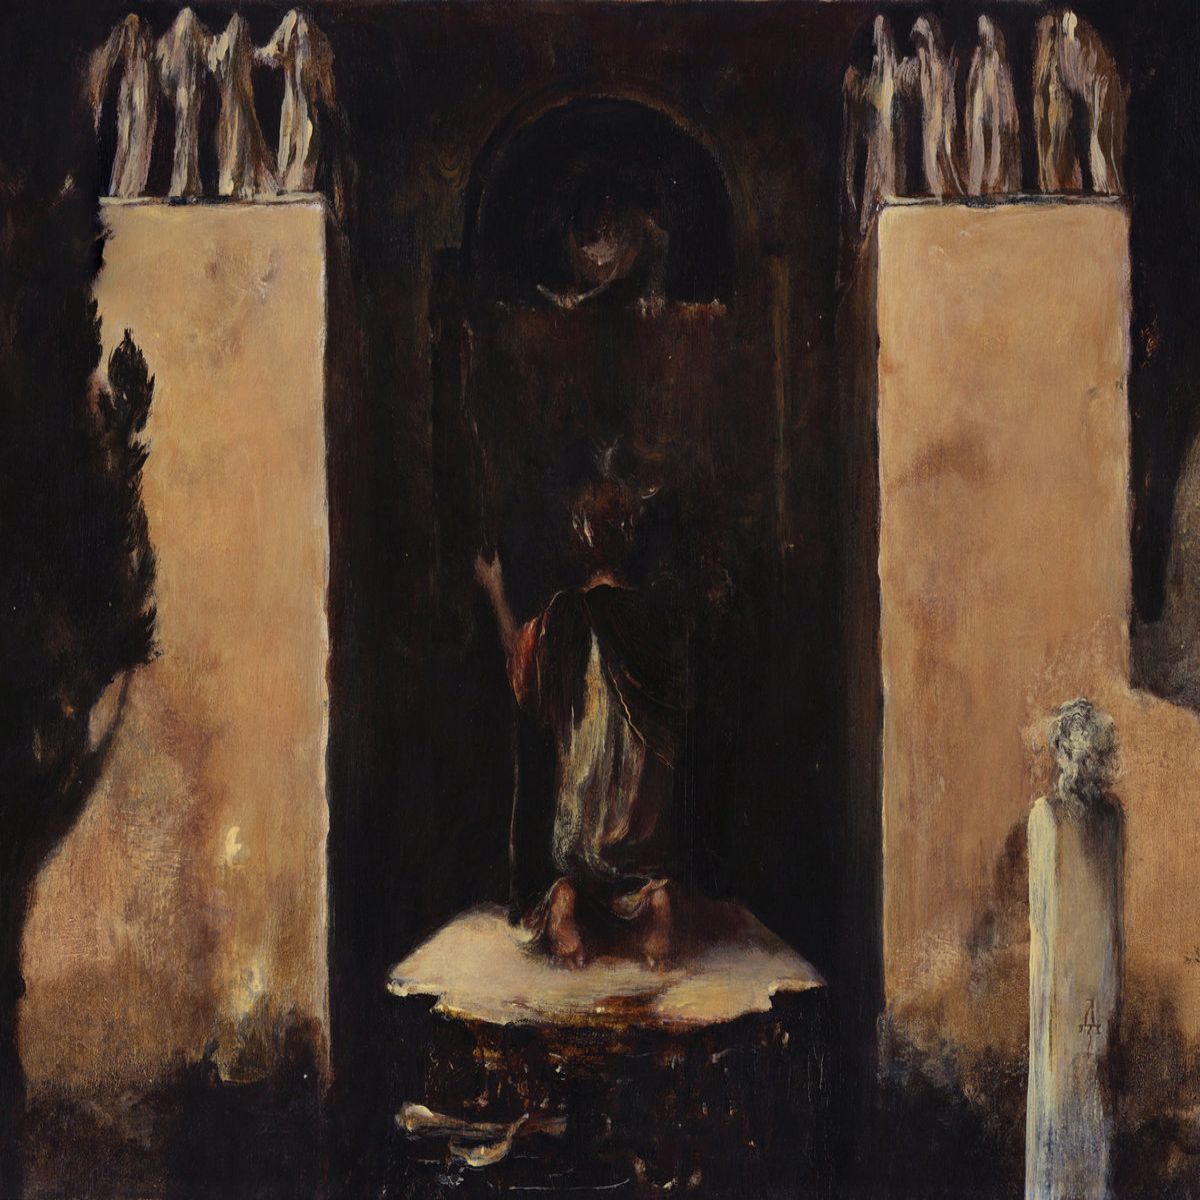 Reviews for Grave Miasma - Odori Sepulcrorum